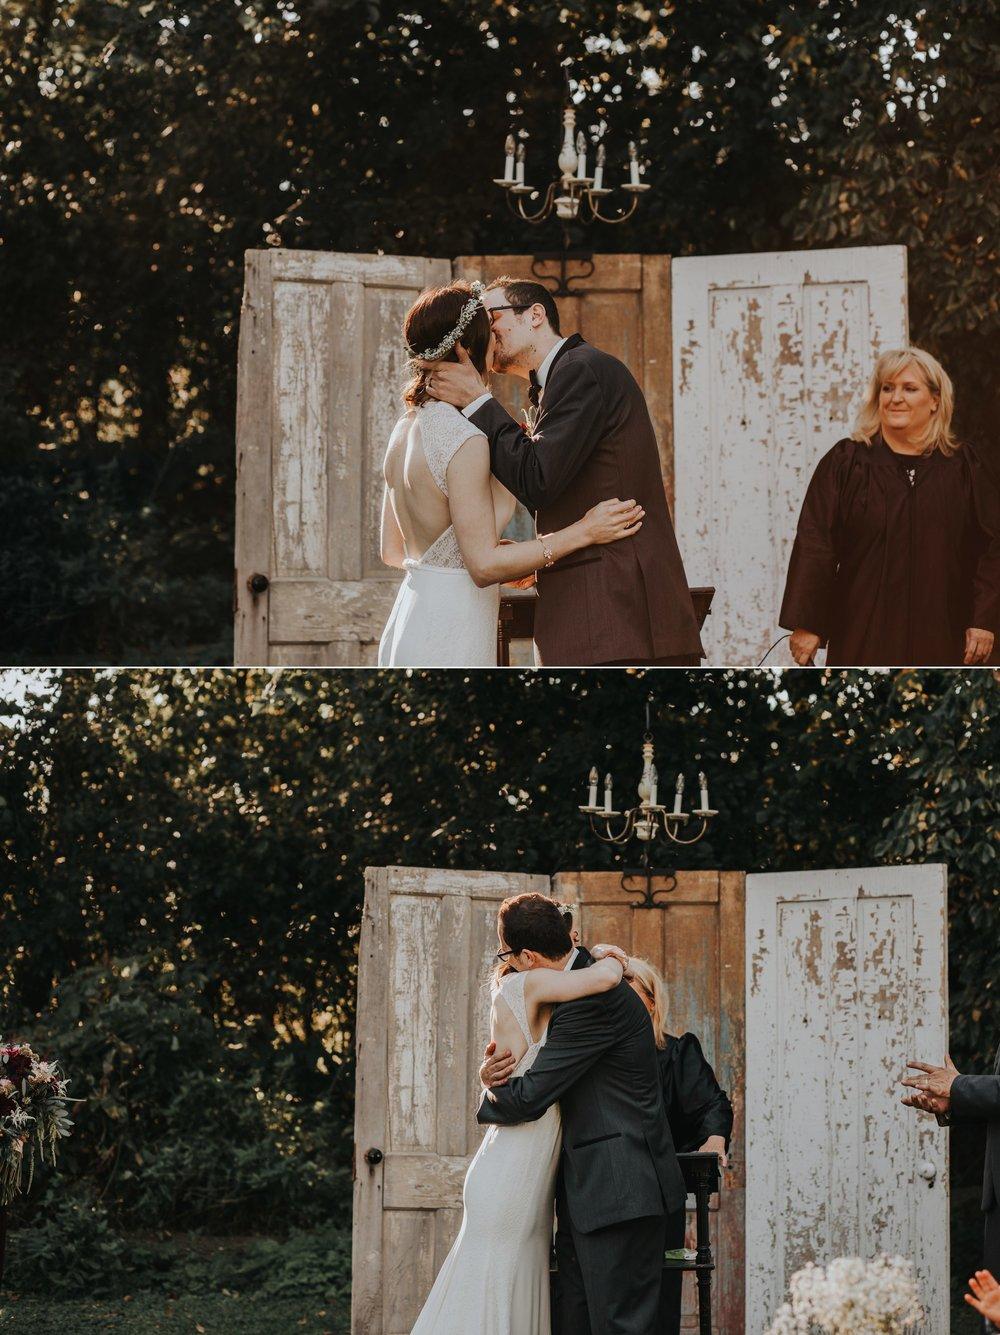 caroline and taylor minneapolis minnesota texas austin dallas houston wedding elopement destination intimate adventurous couple best photographer_0241.jpg